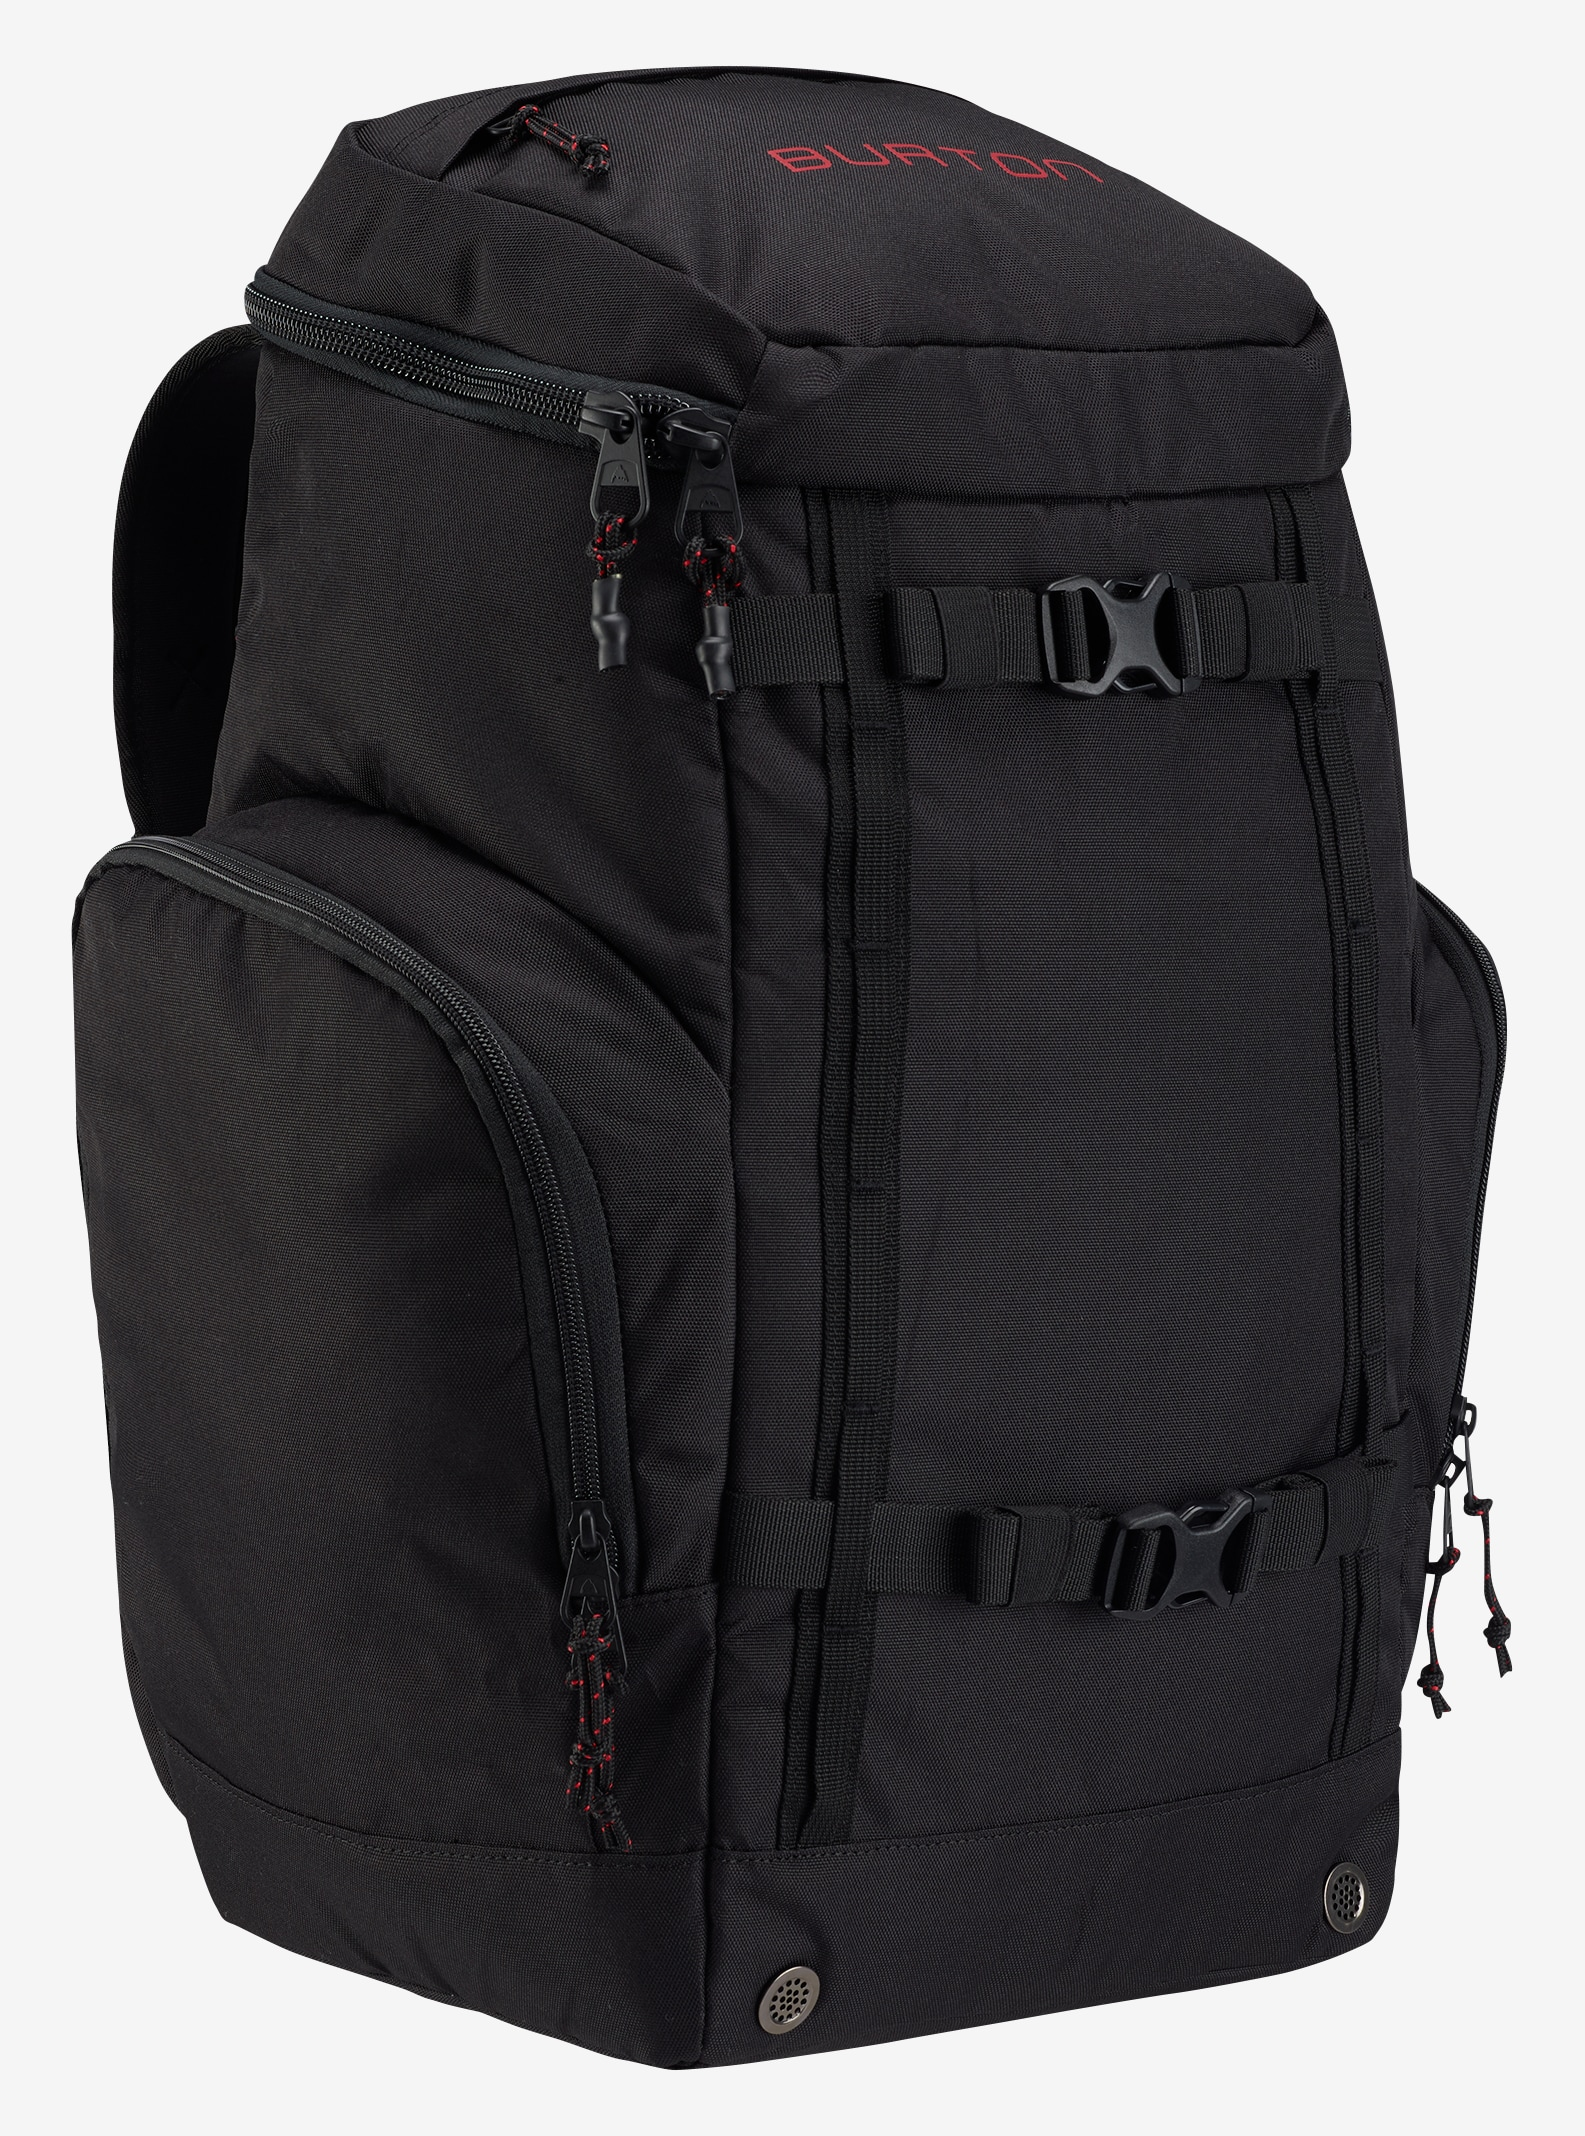 Burton Booter Pack shown in True Black